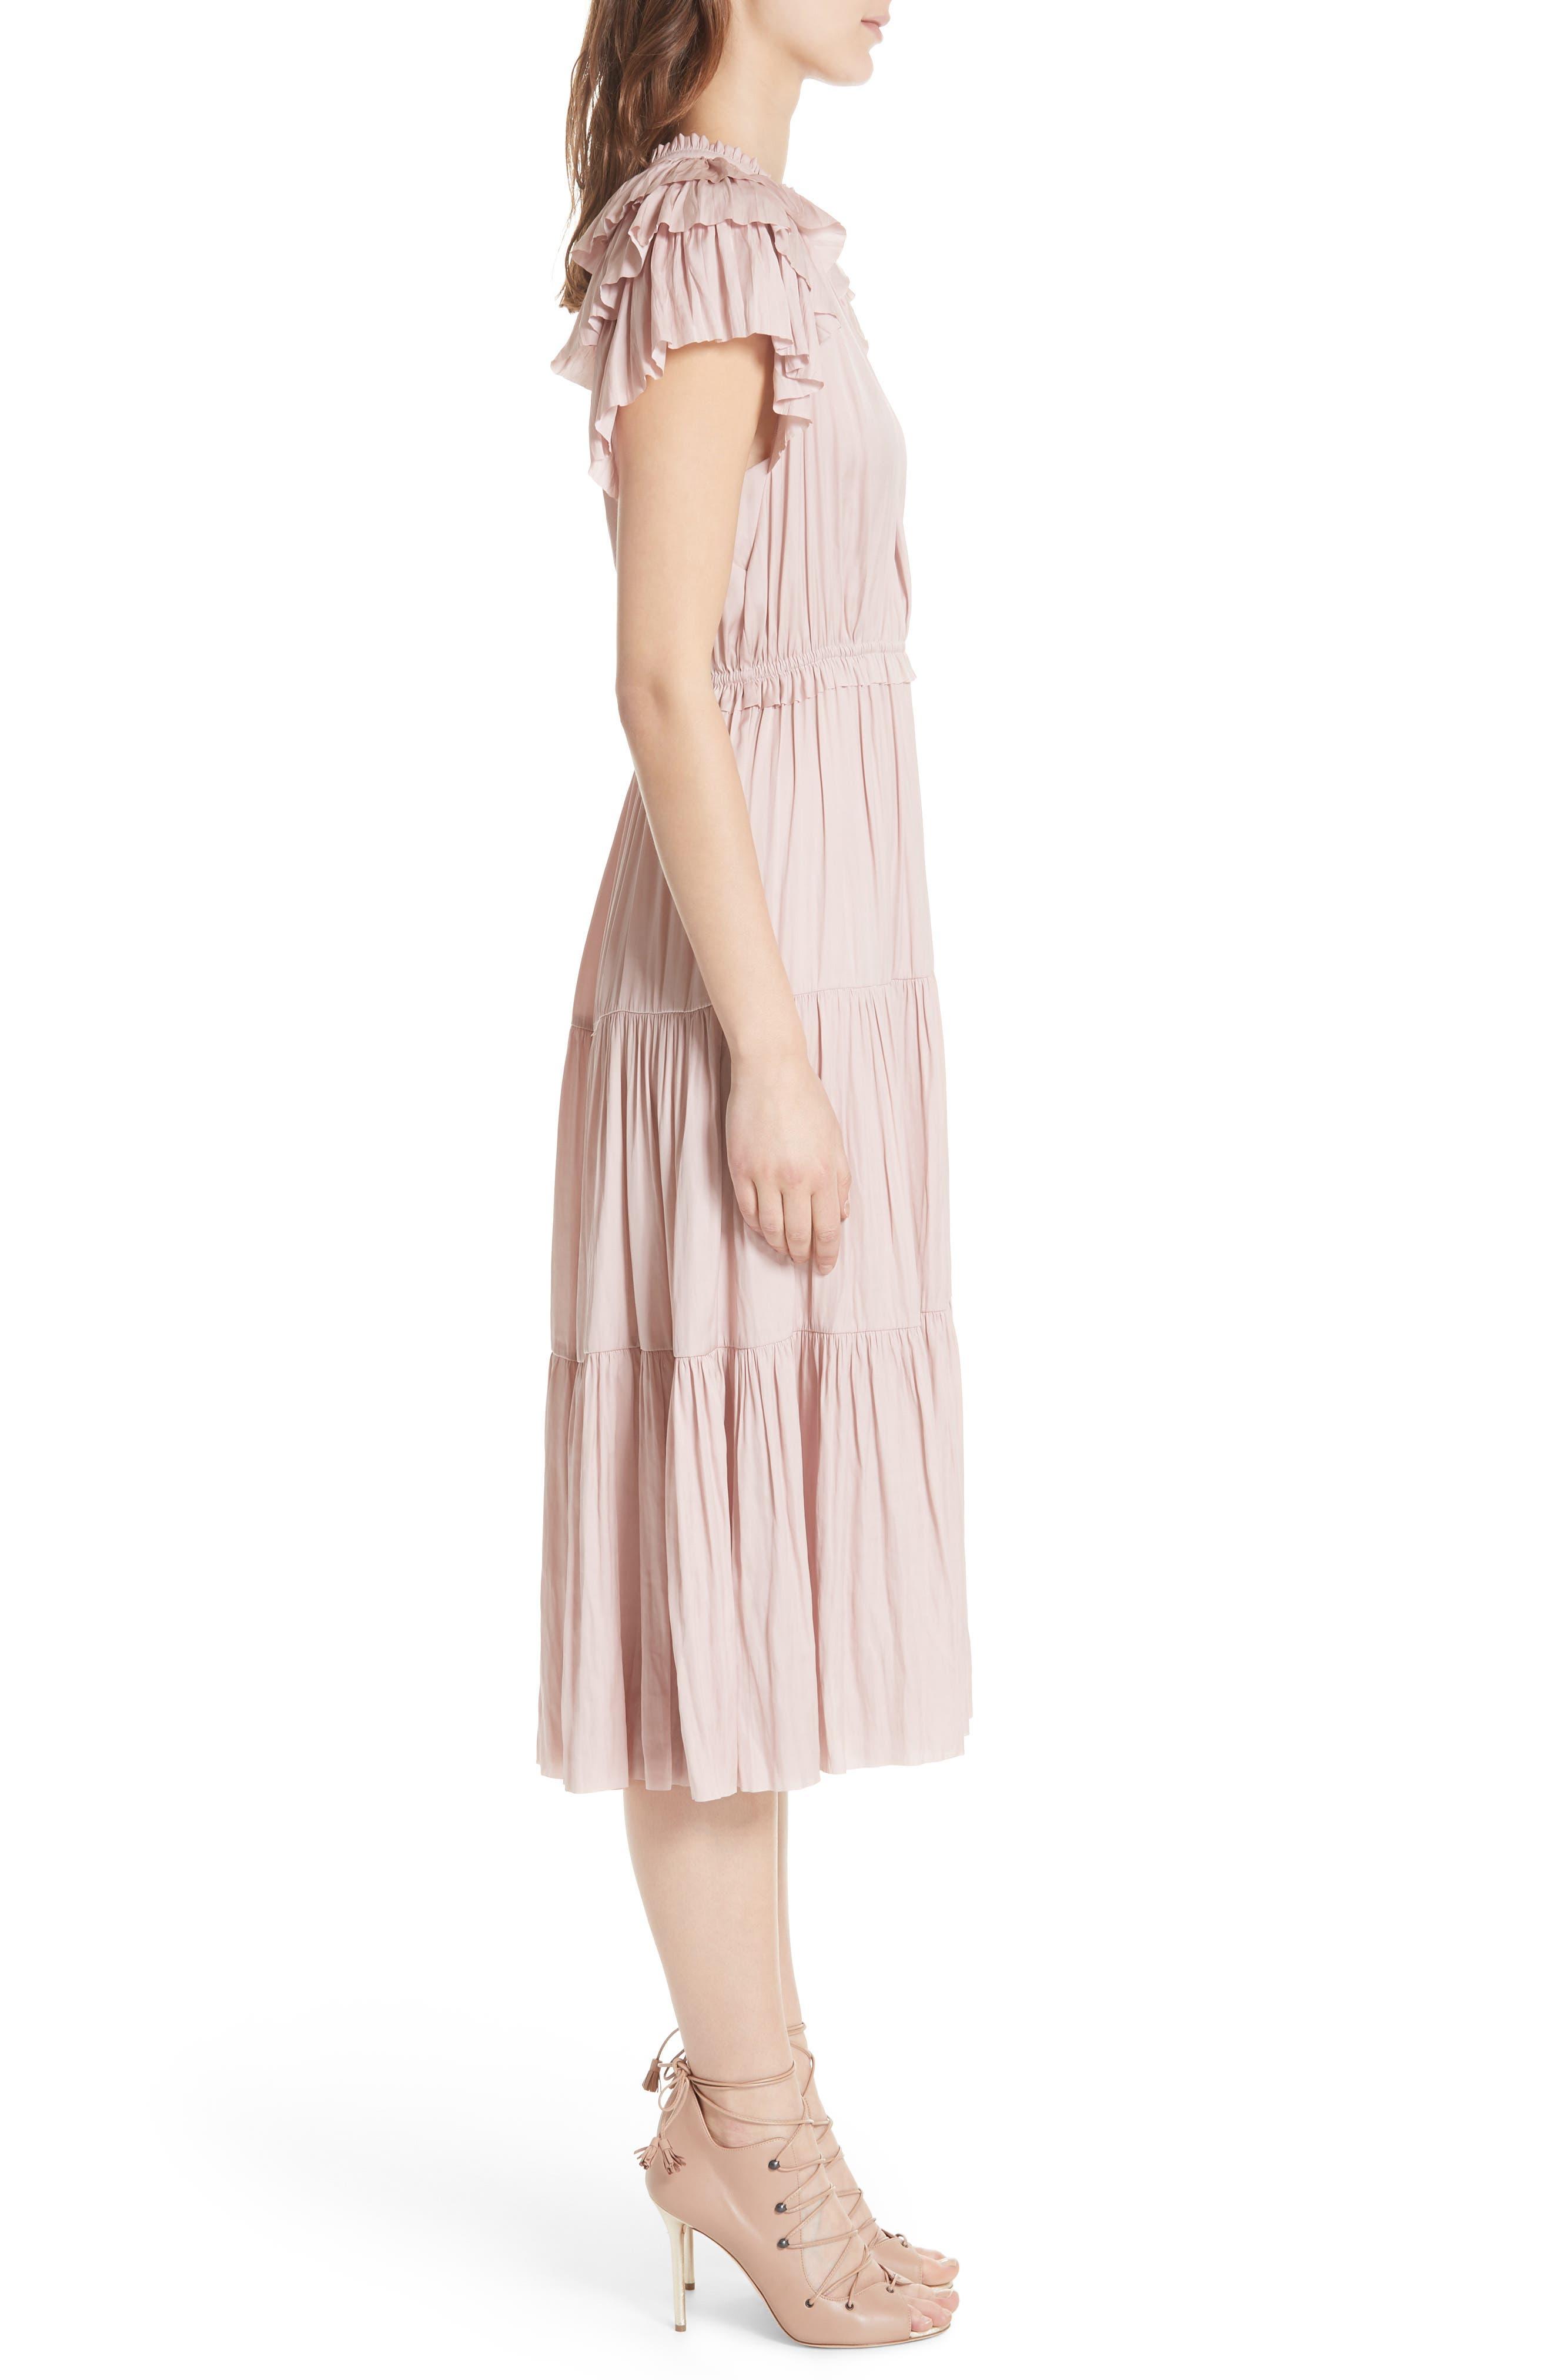 Blaire Satin Dress,                             Alternate thumbnail 3, color,                             Rose